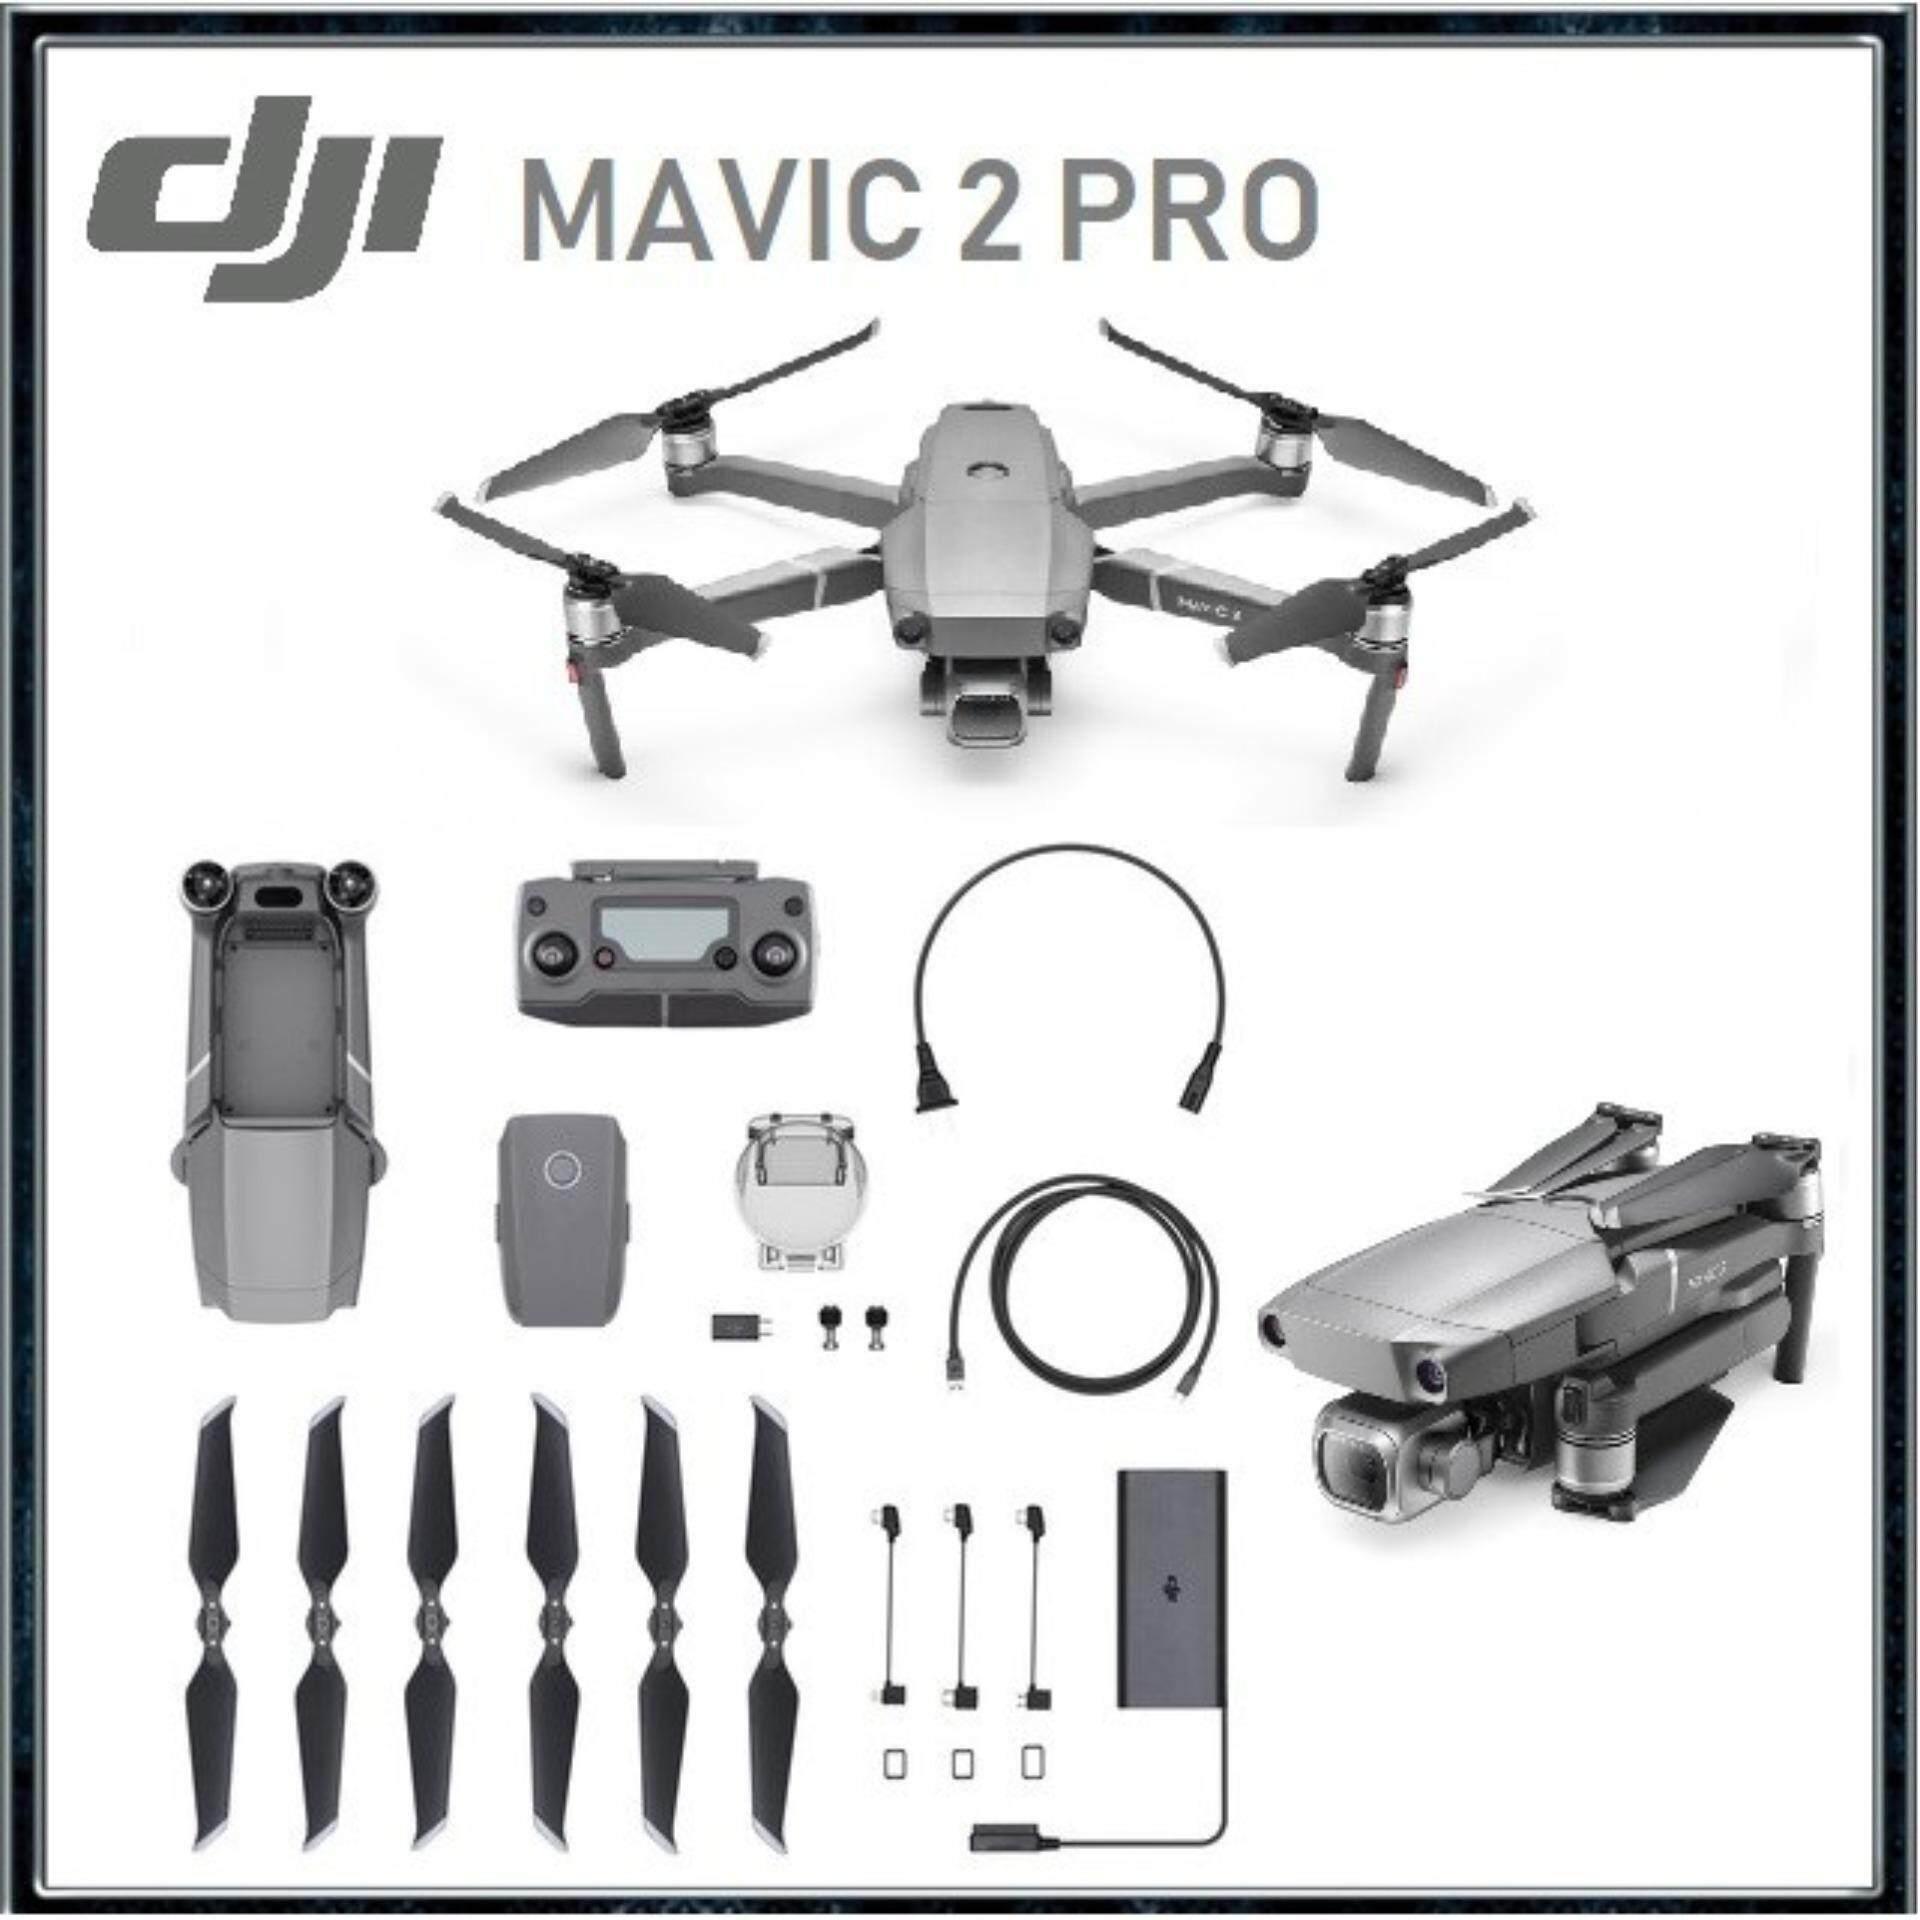 DJI Mavic 2 Pro [Original DJI Warranty]